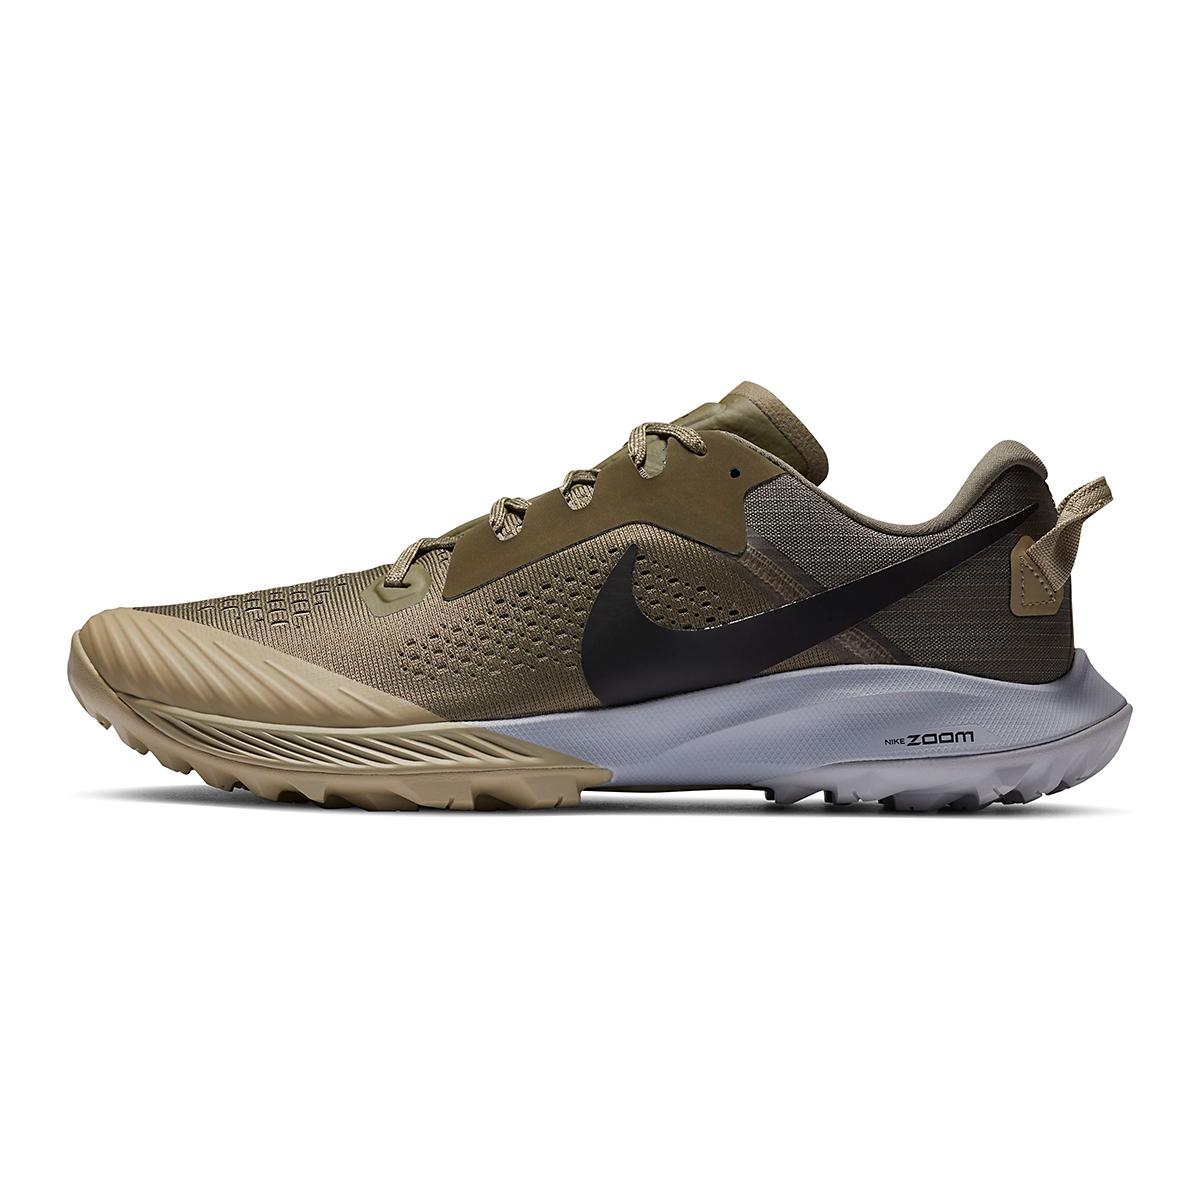 Men's Nike Air Zoom Terra Kiger 6 Trail Running Shoe - Color: Medium Olive/Medium Khaki/Wolf Grey/Black - Size: 6 - Width: Regular, Medium Olive/Medium Khaki/Wolf Grey/Black, large, image 3